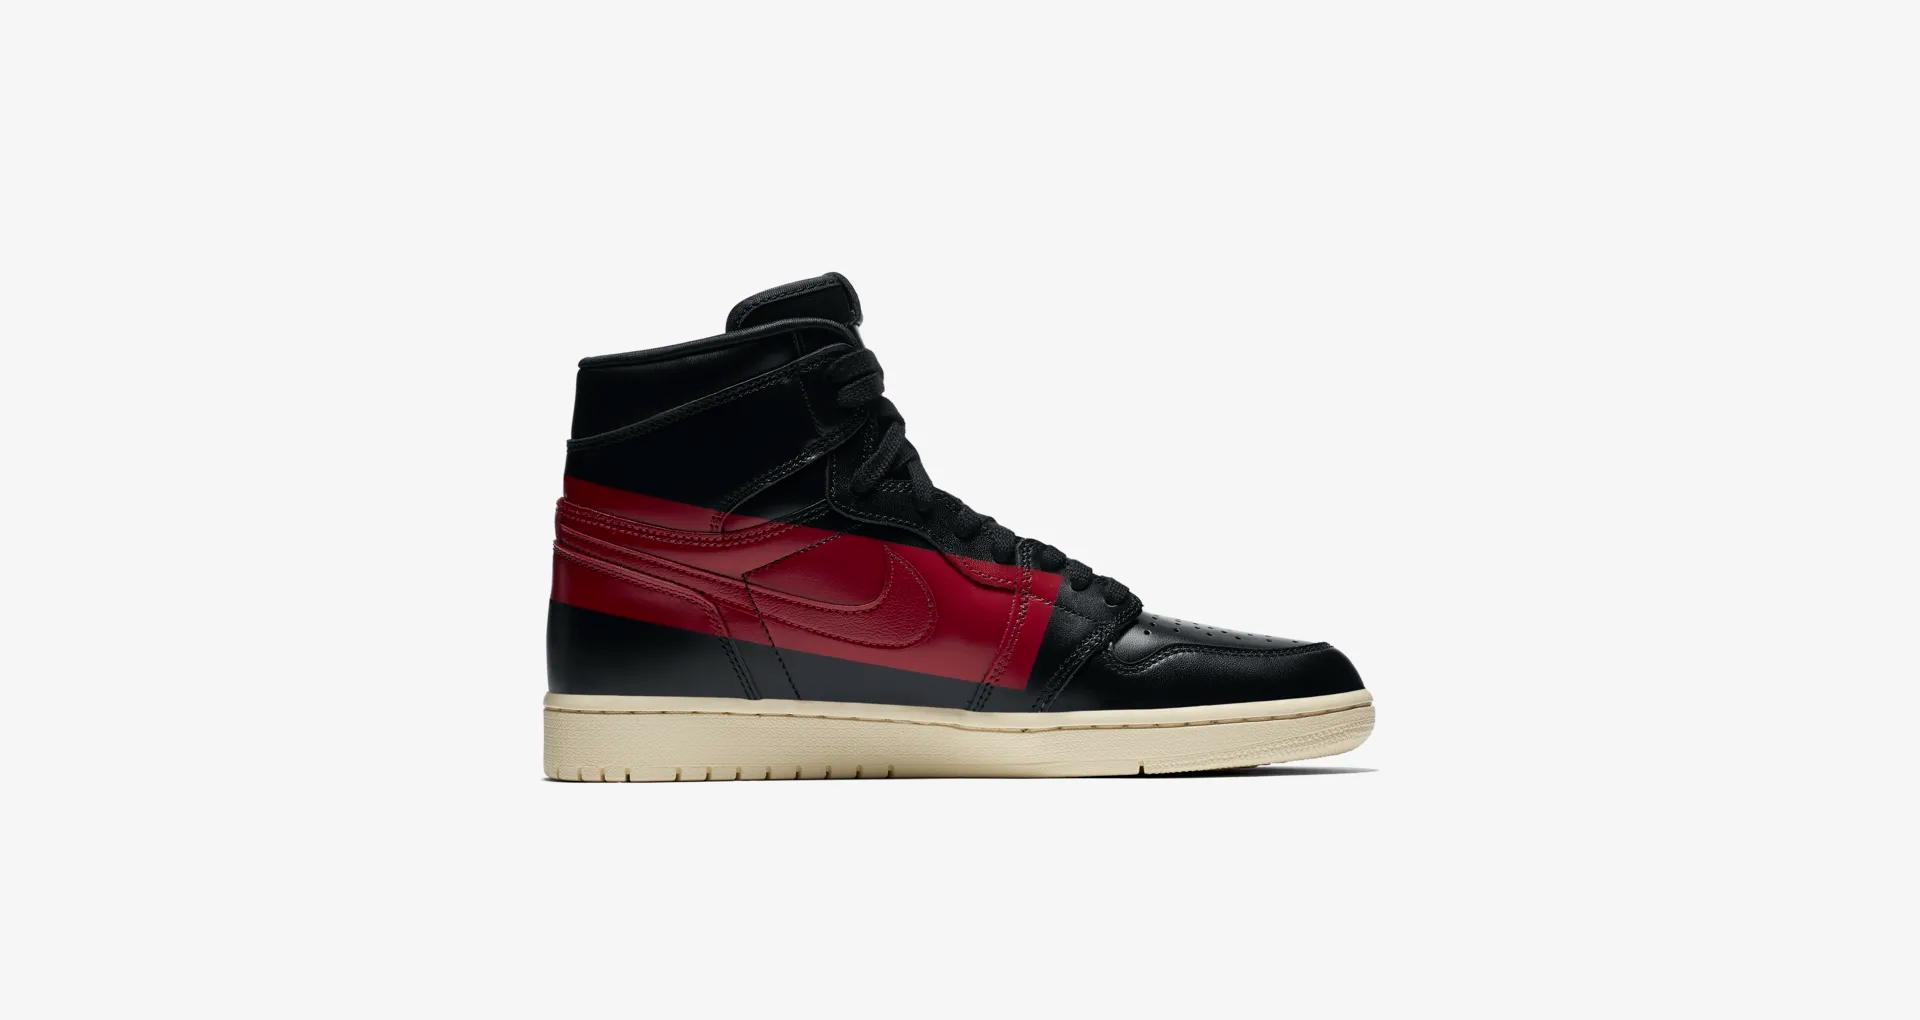 BQ6682 006 Air Jordan 1 High OG Couture 3